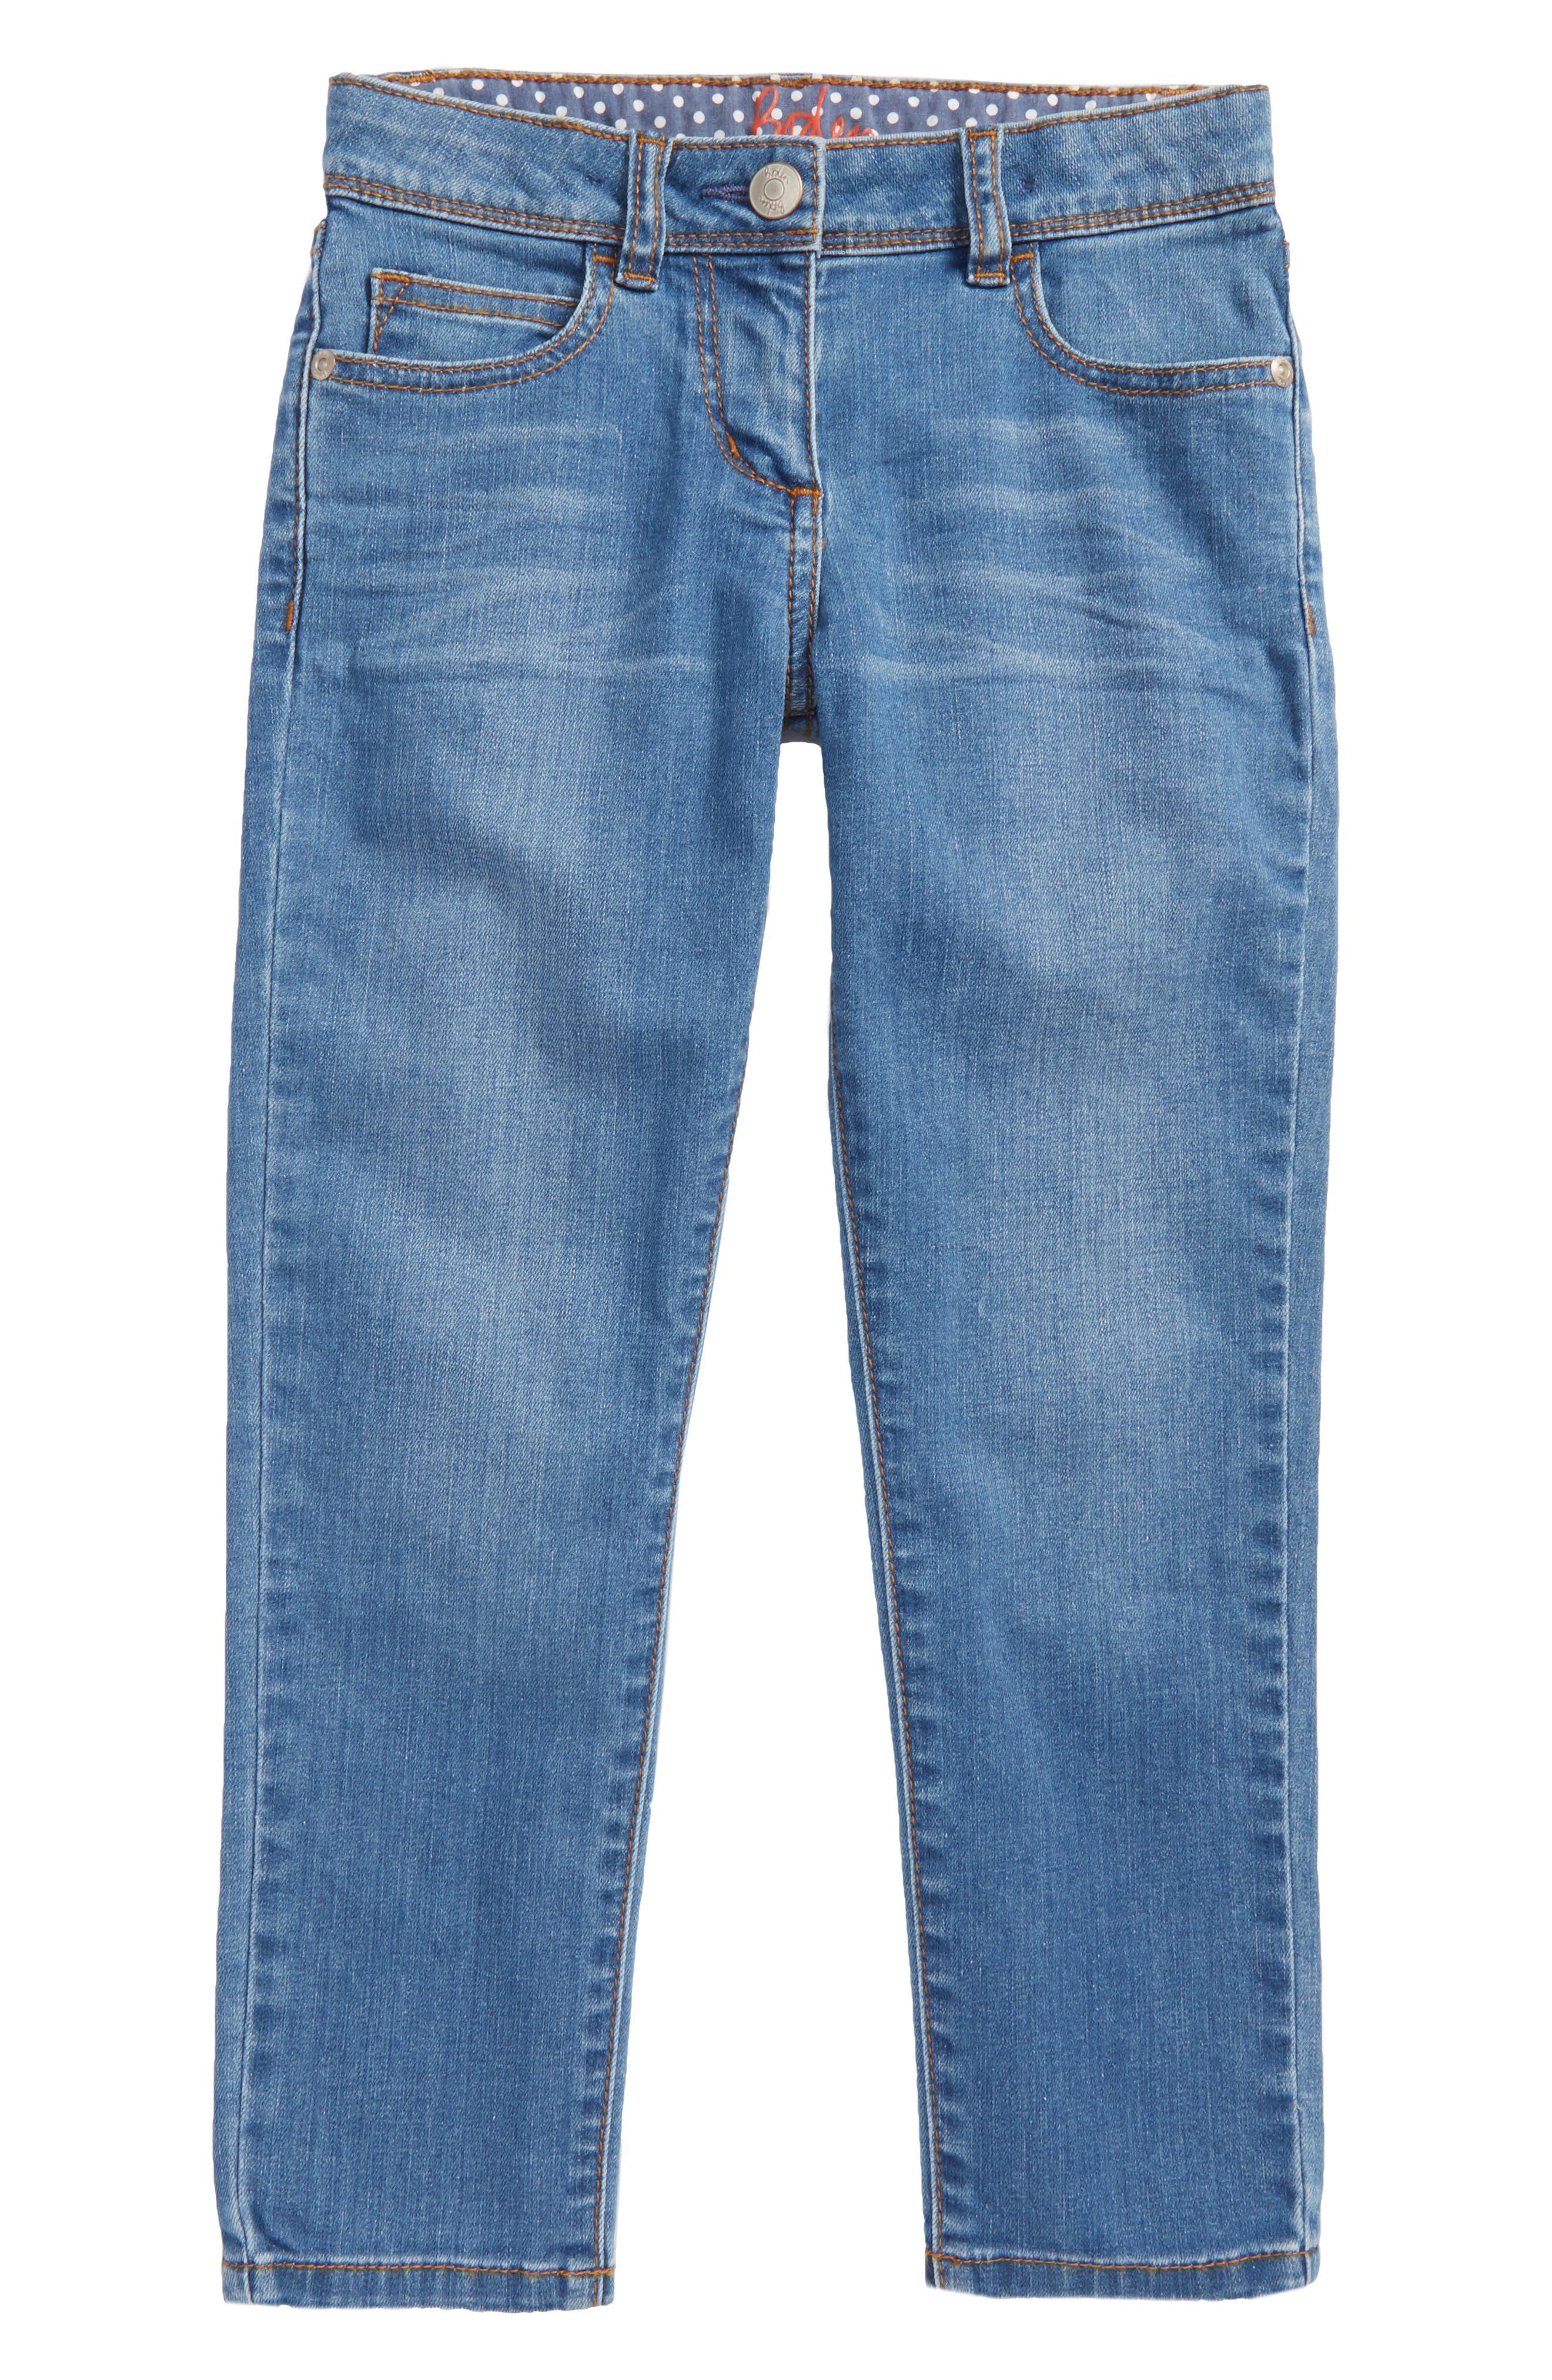 Skinny Jeans,                             Main thumbnail 1, color,                             Light Vintage Ldn